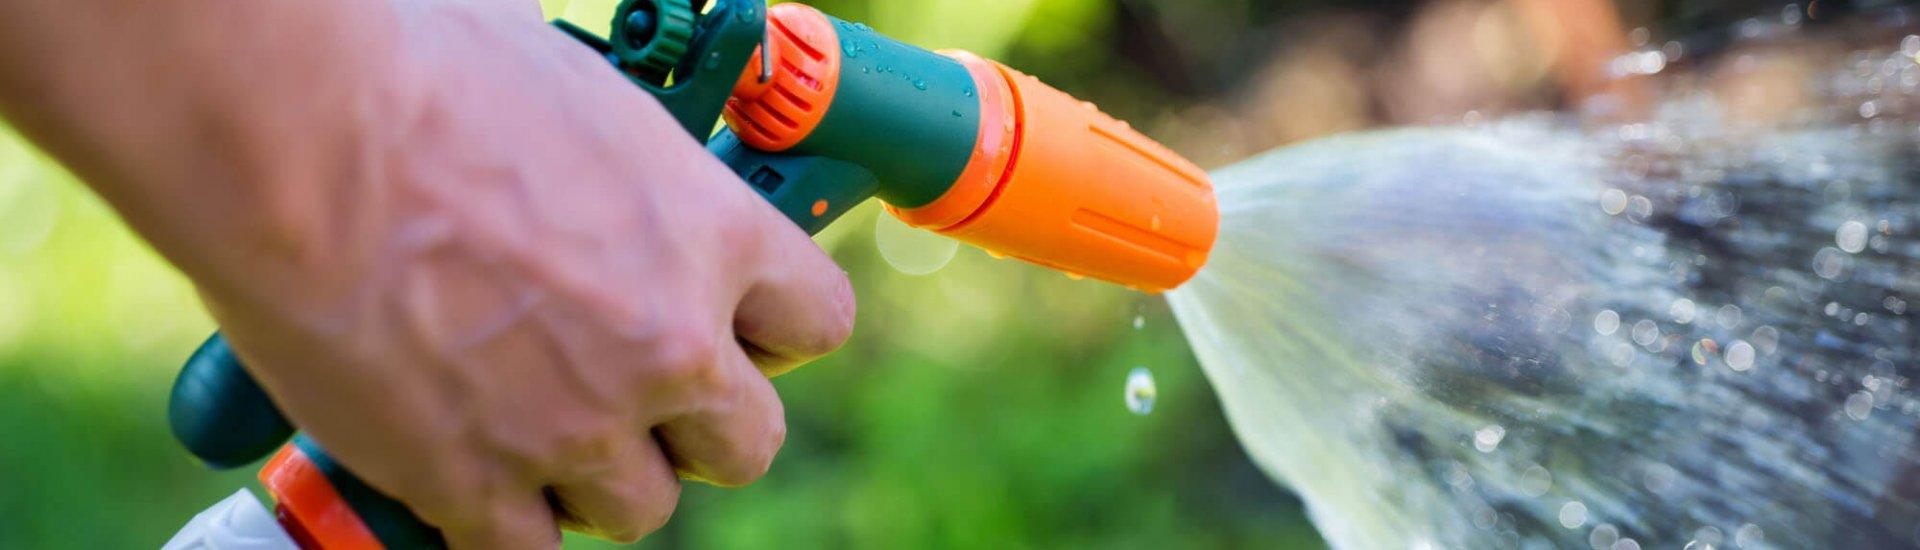 Rasen richtig bewässern: Zeitpunkt, Wassermenge & Geräte zur Bewässerung